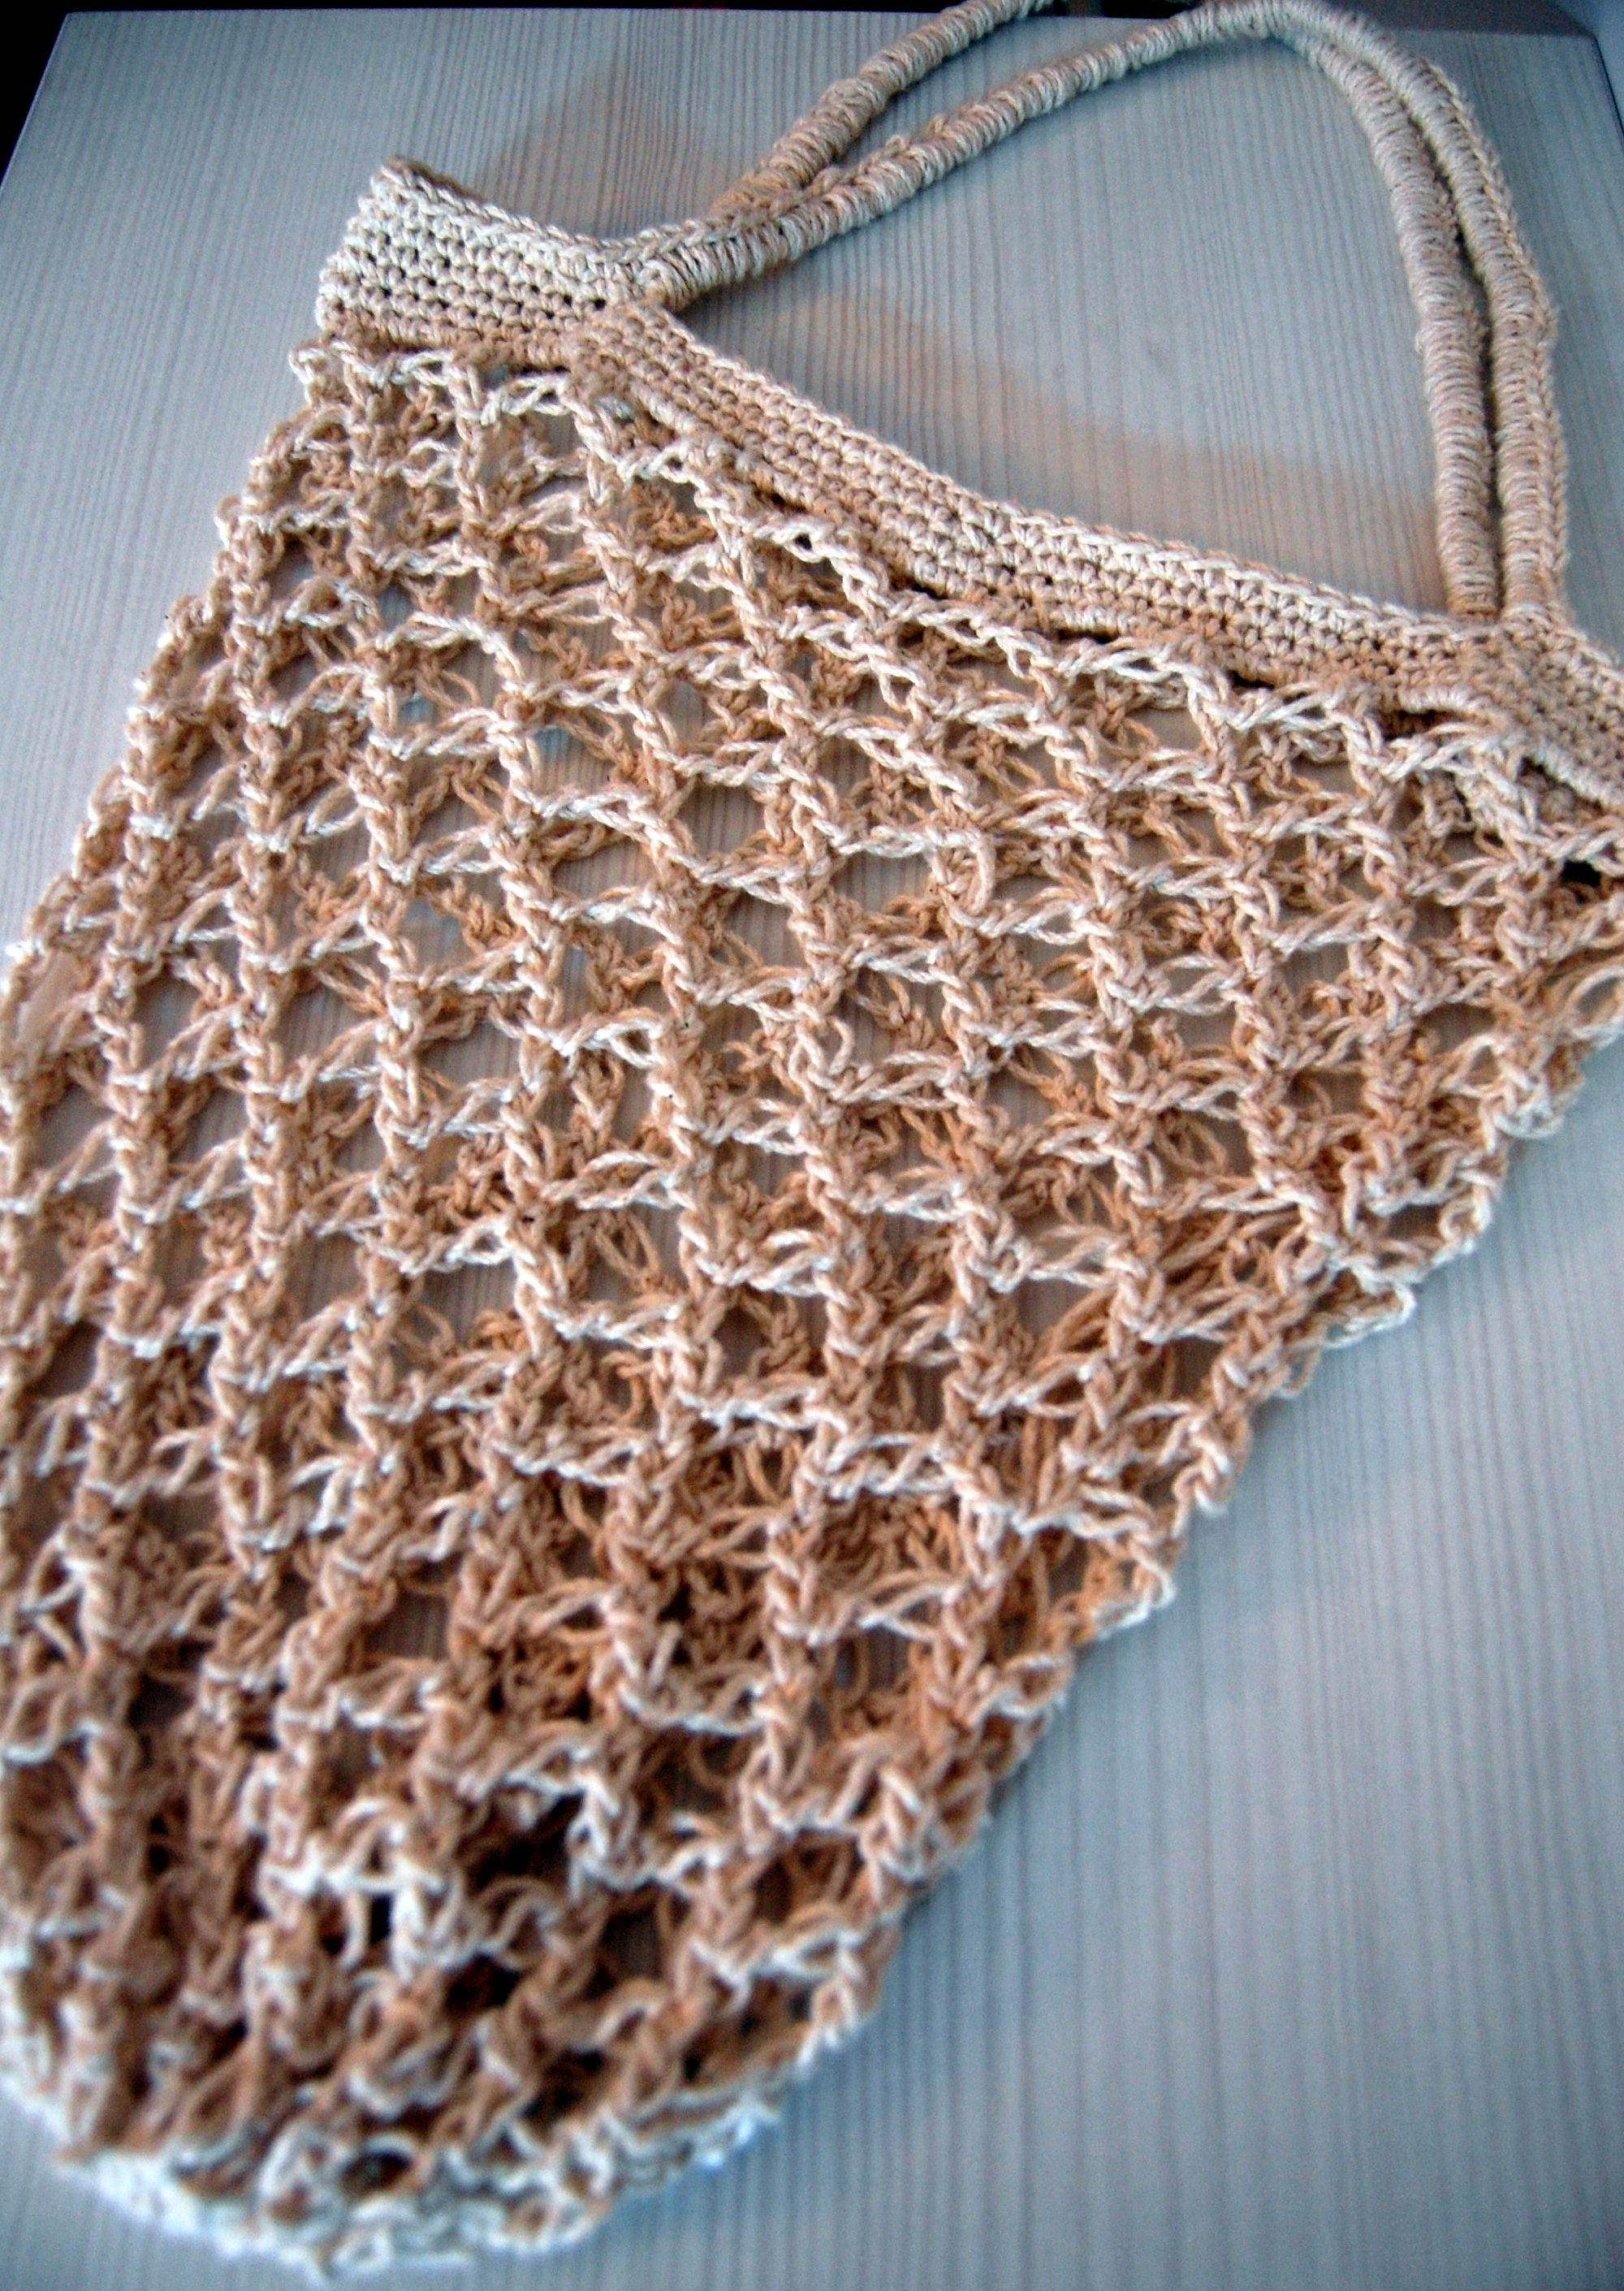 Crochet shopping bag Sewing Crafts Pinterest